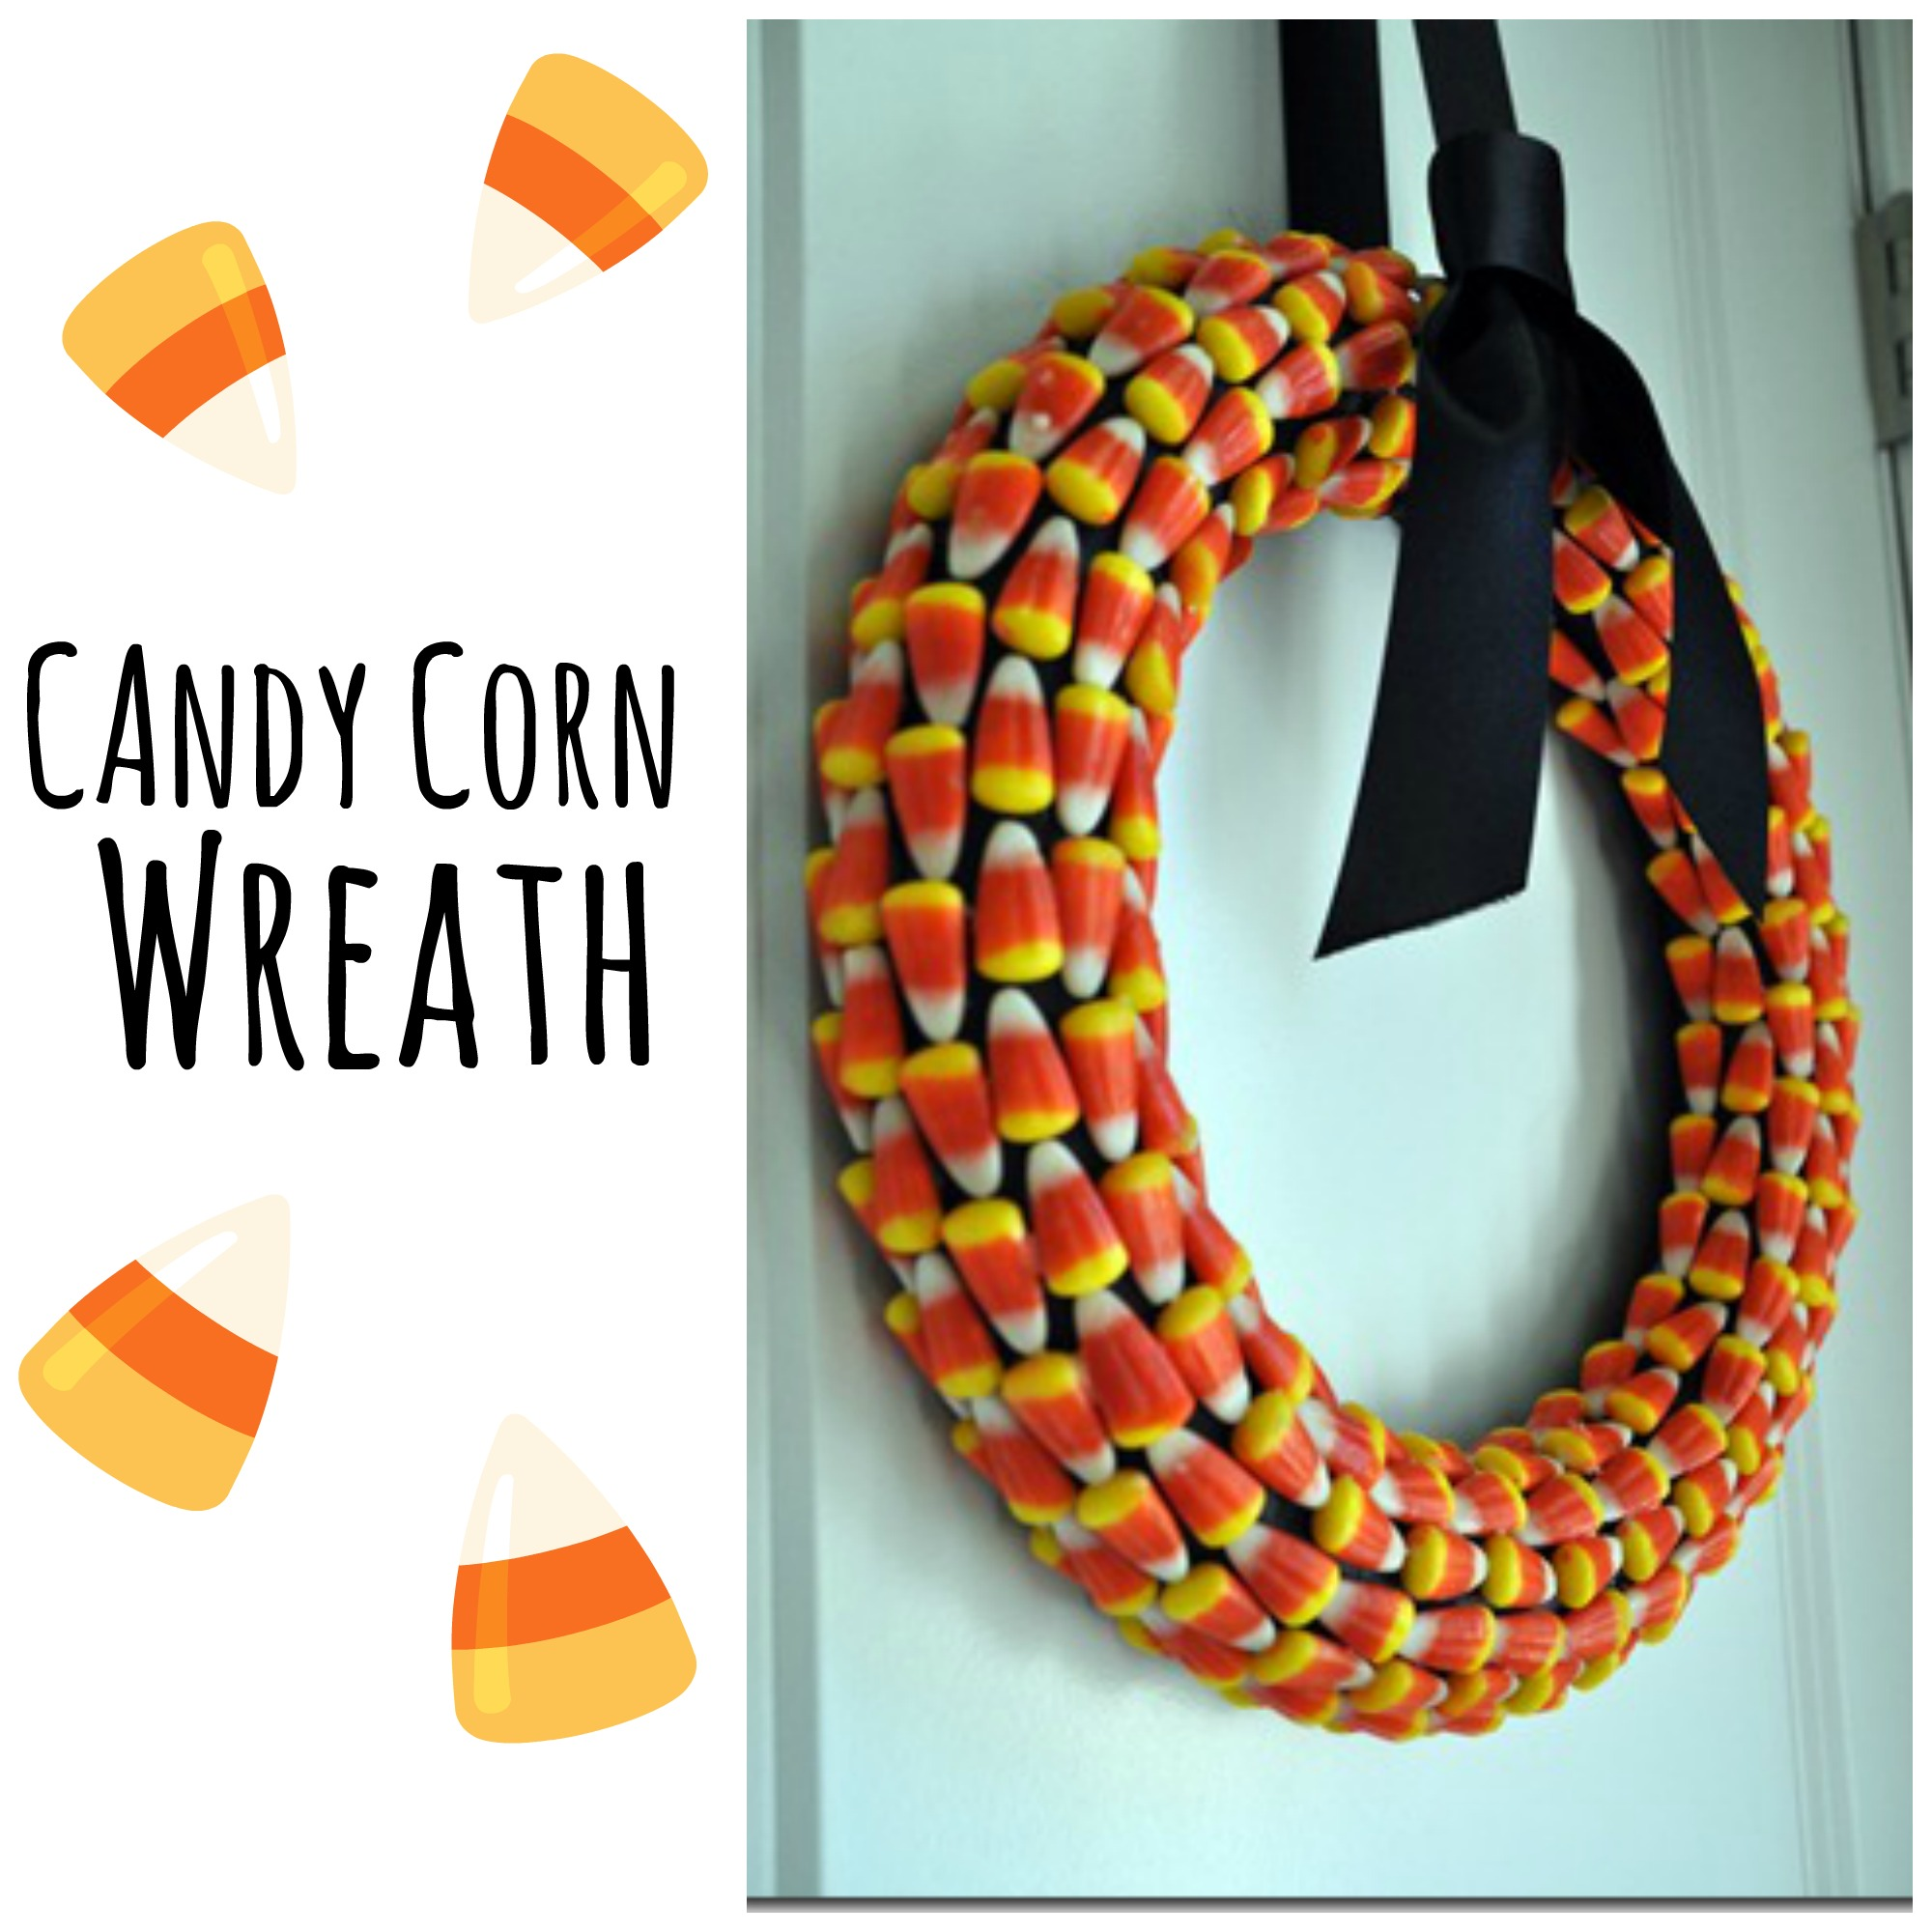 Candy Corn Wreath.jpg